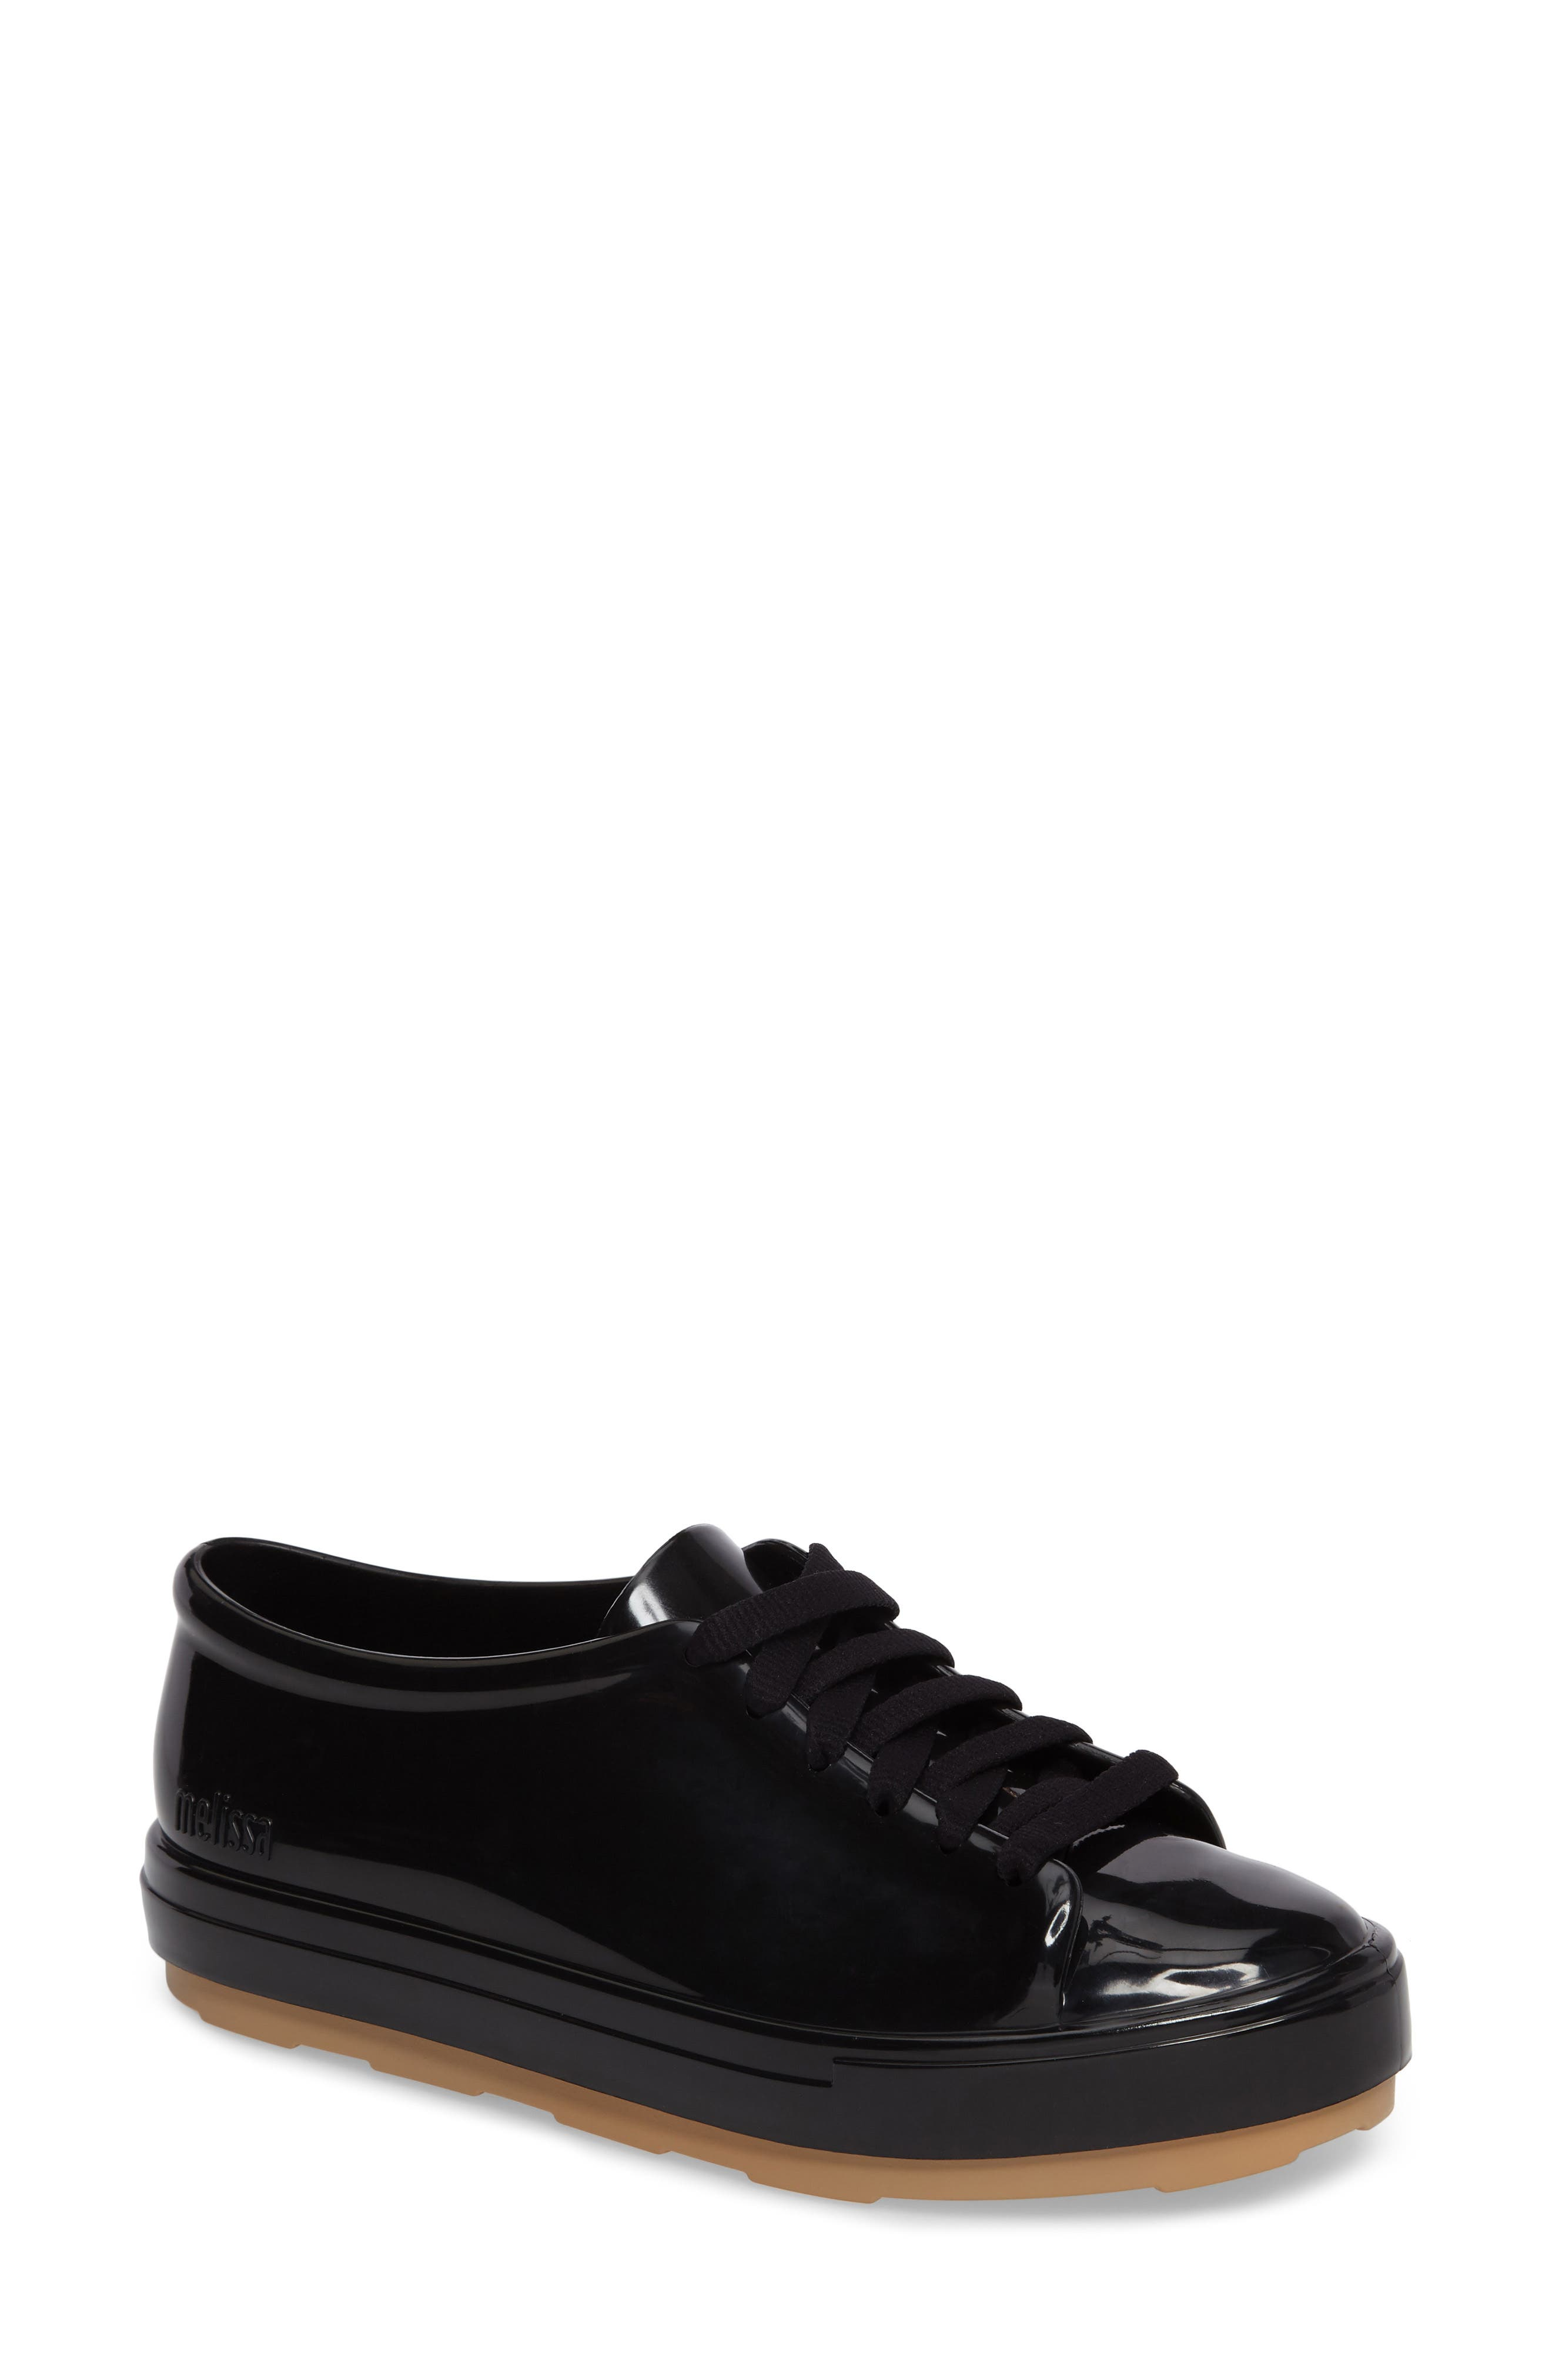 Be Sneaker,                         Main,                         color, 009